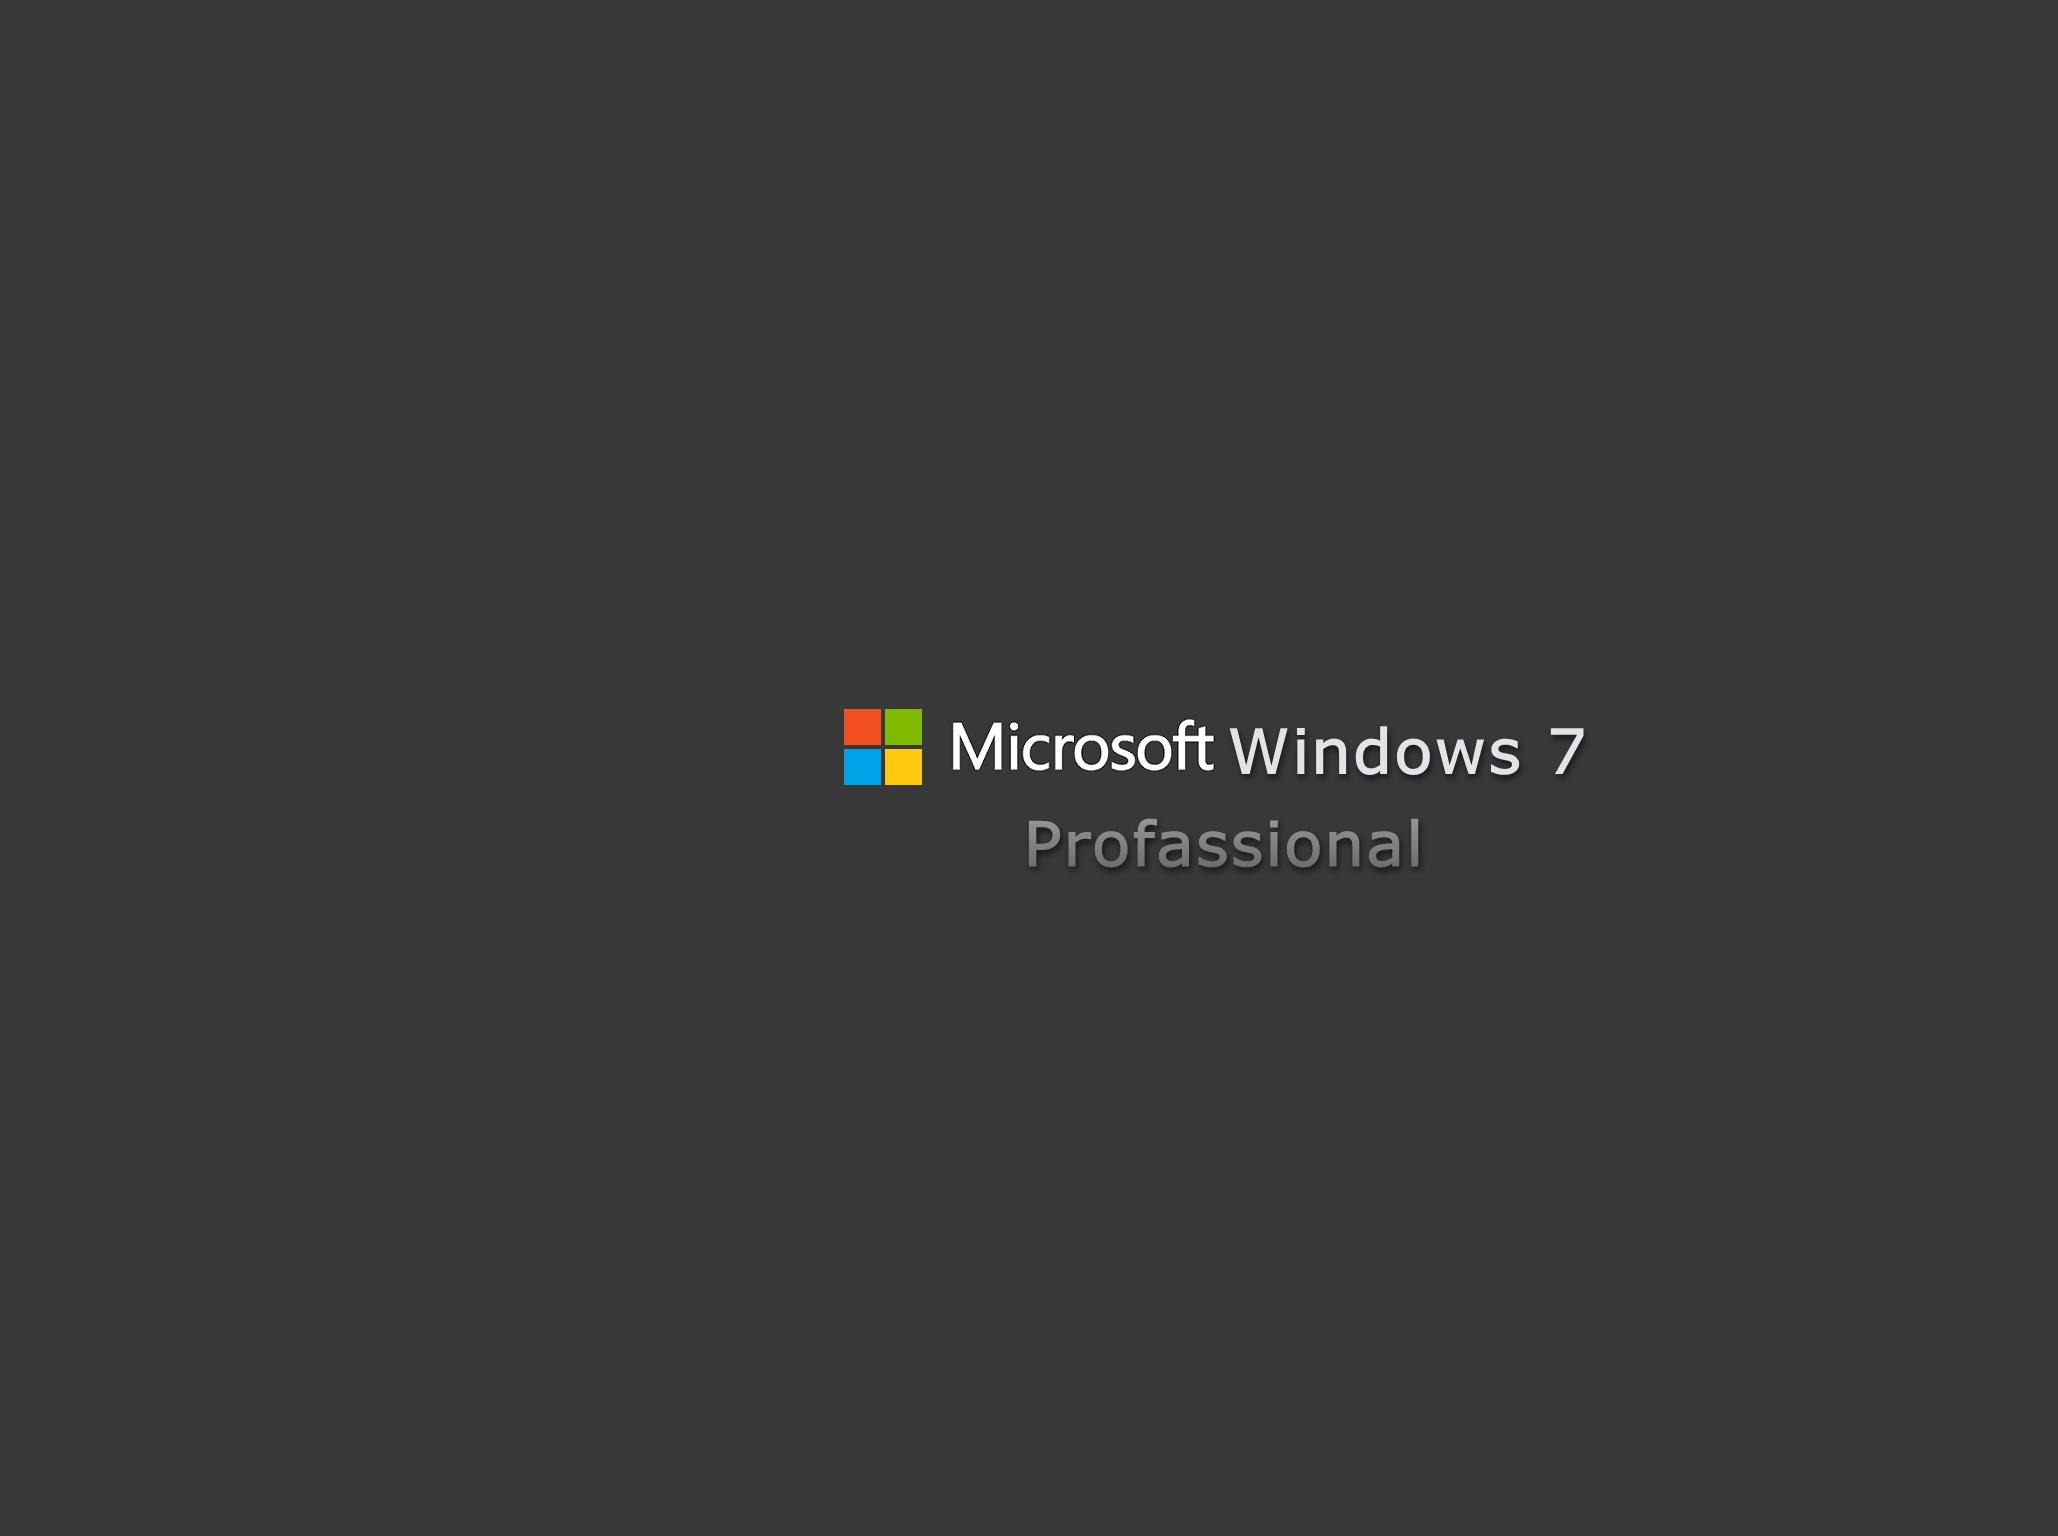 brands-logos-windows-black-and-white-windows-7-professional-wallpaper-1920x1080.jpg